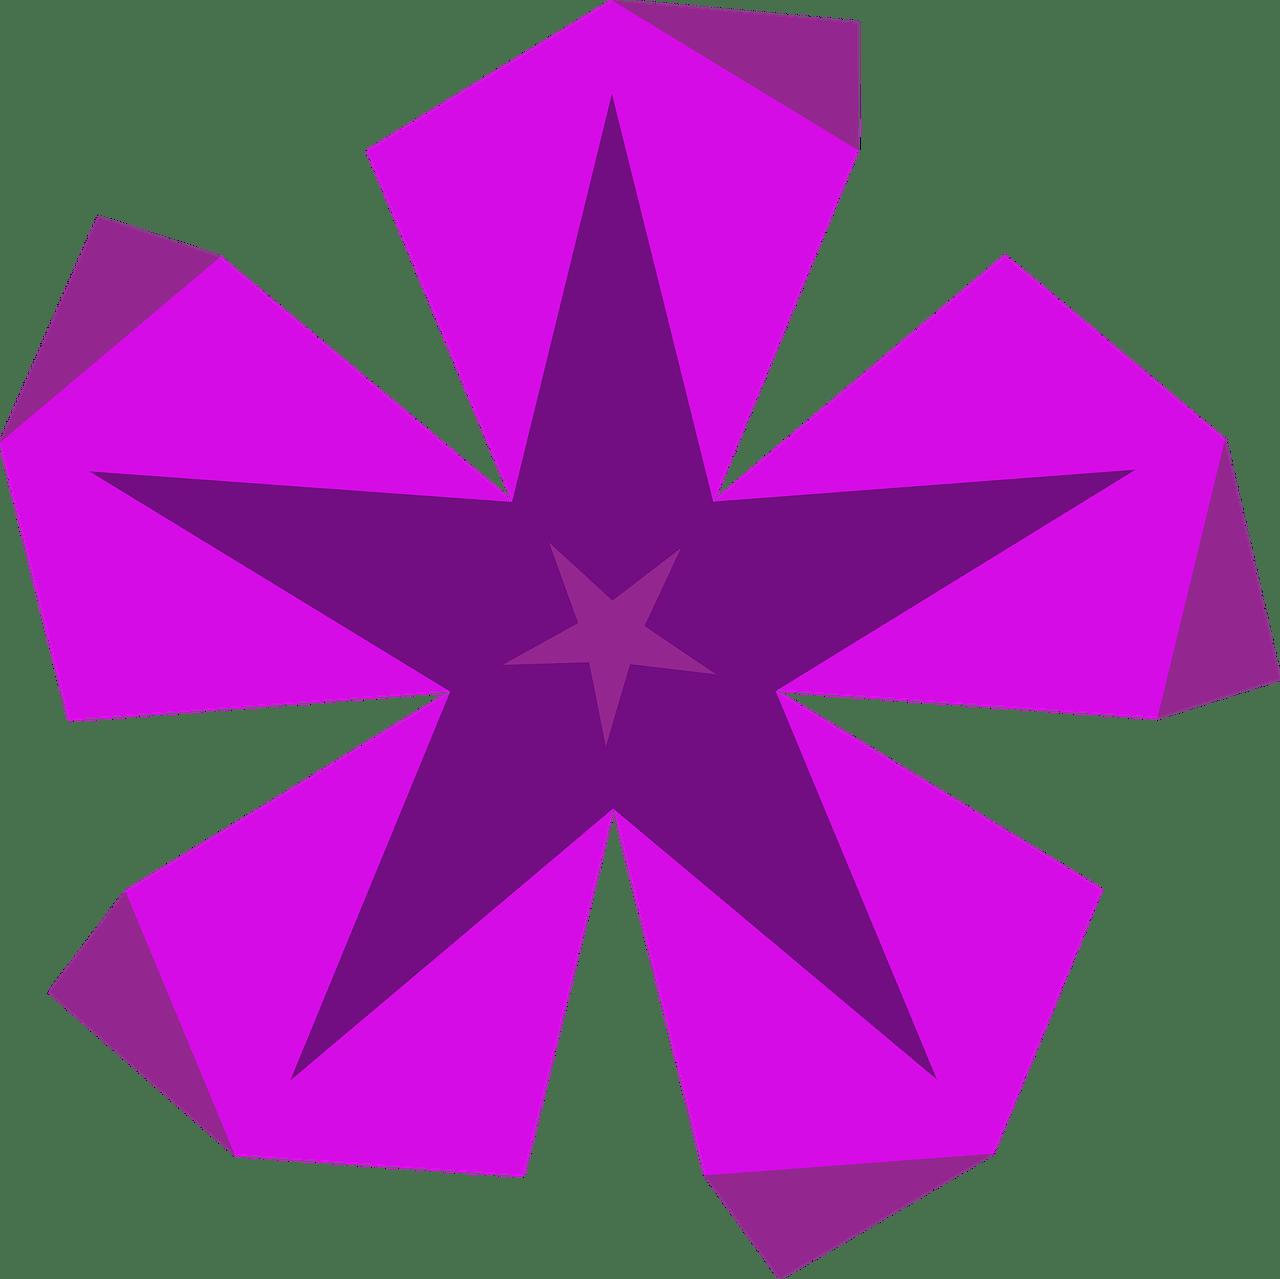 Pink purple black cool star clipart svg library library Black and White Shooting Star Clipart transparent PNG - StickPNG svg library library